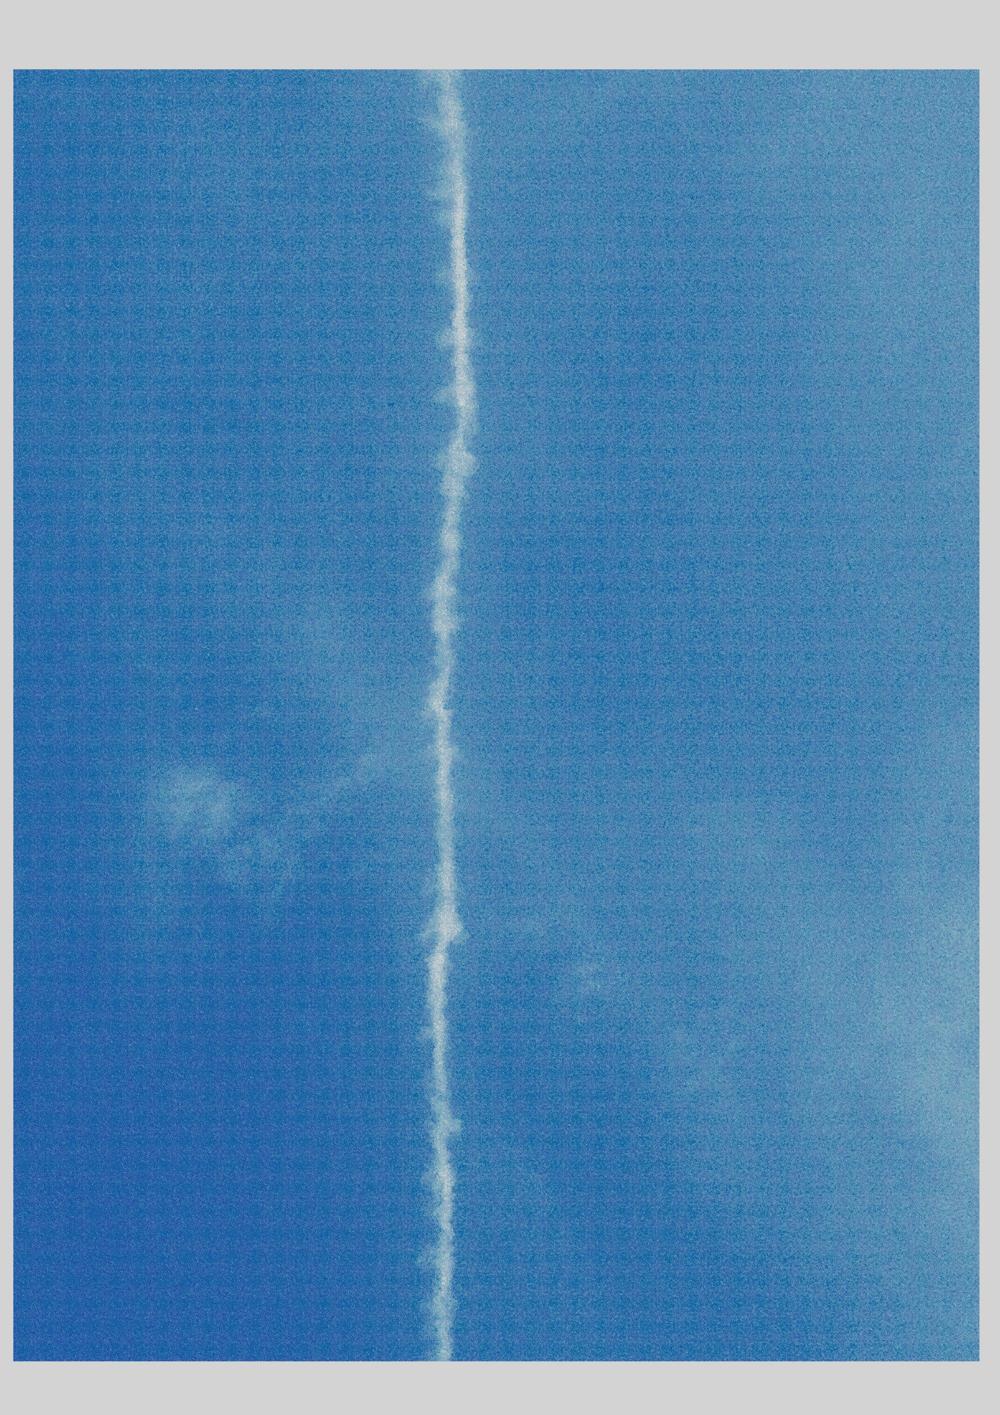 Opprobrium. Single colour screenprint. 2015.